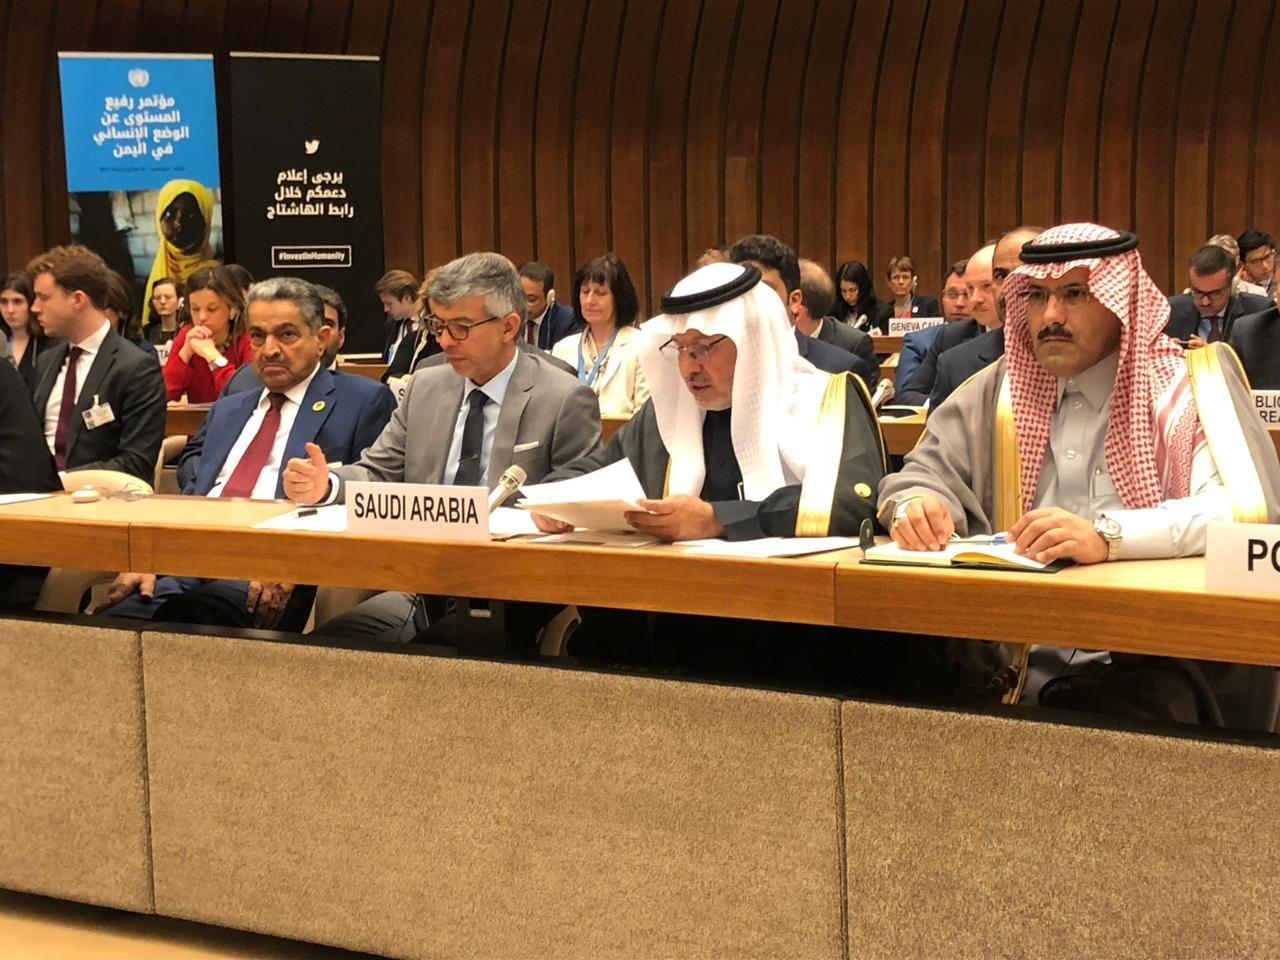 Saudi Arabia Donates an Additional USD $500 Million to Yemen